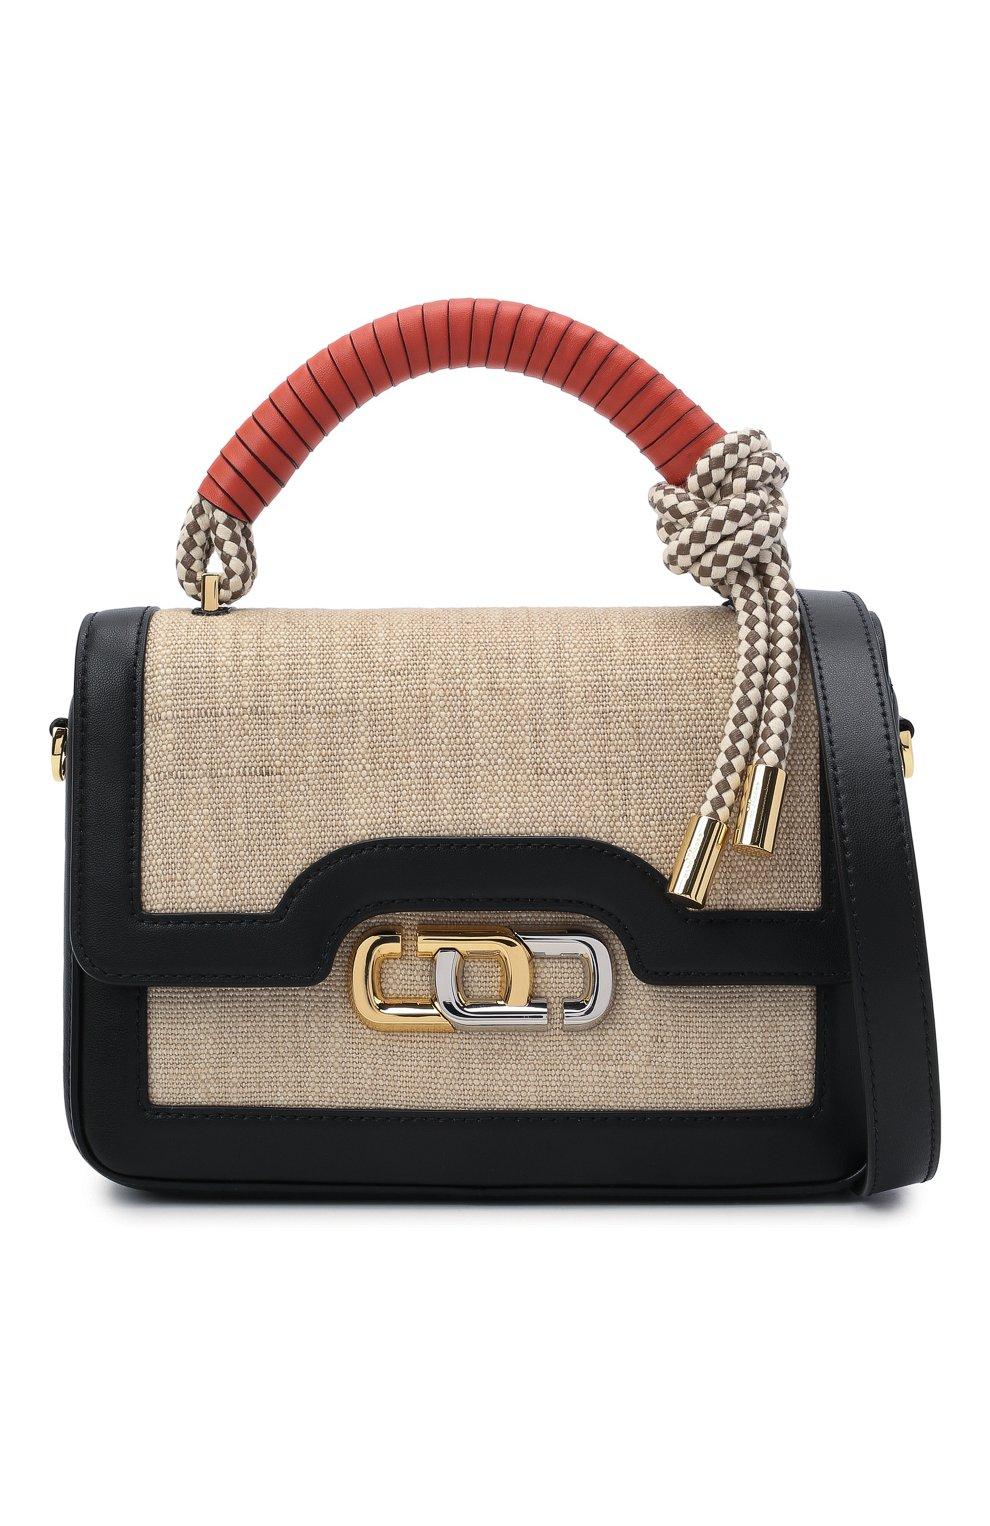 Женская сумка the j link MARC JACOBS (THE) бежевого цвета, арт. H901M02PF21 | Фото 6